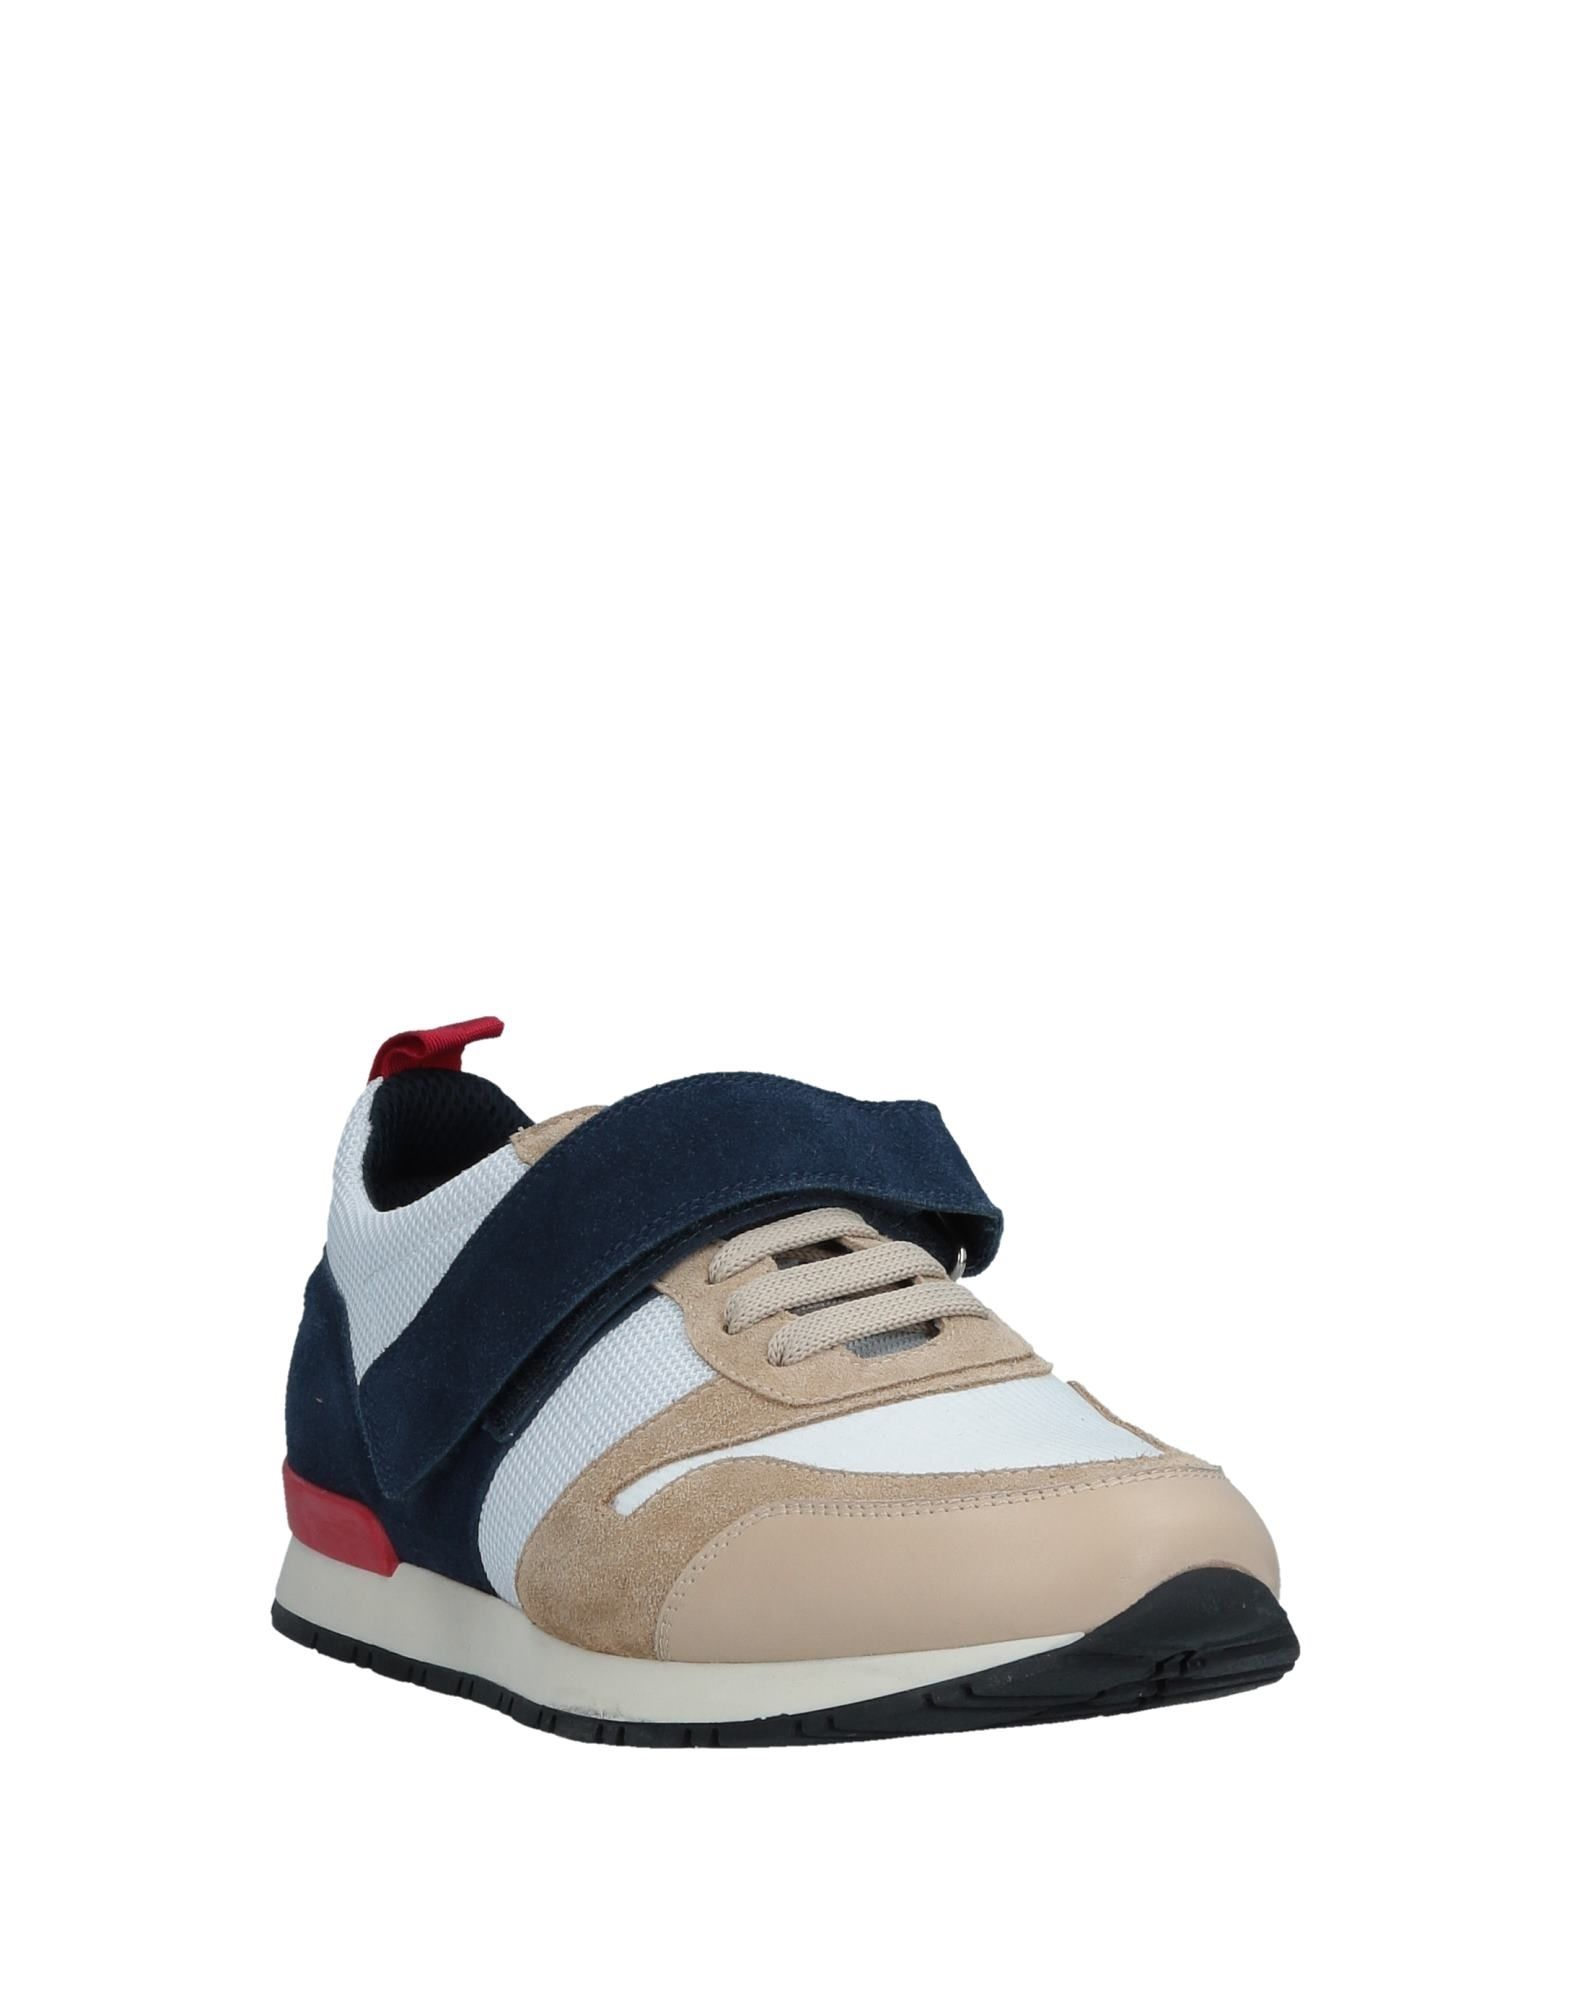 Dondup Gute Sneakers Herren  11525212NH Gute Dondup Qualität beliebte Schuhe 66adf6